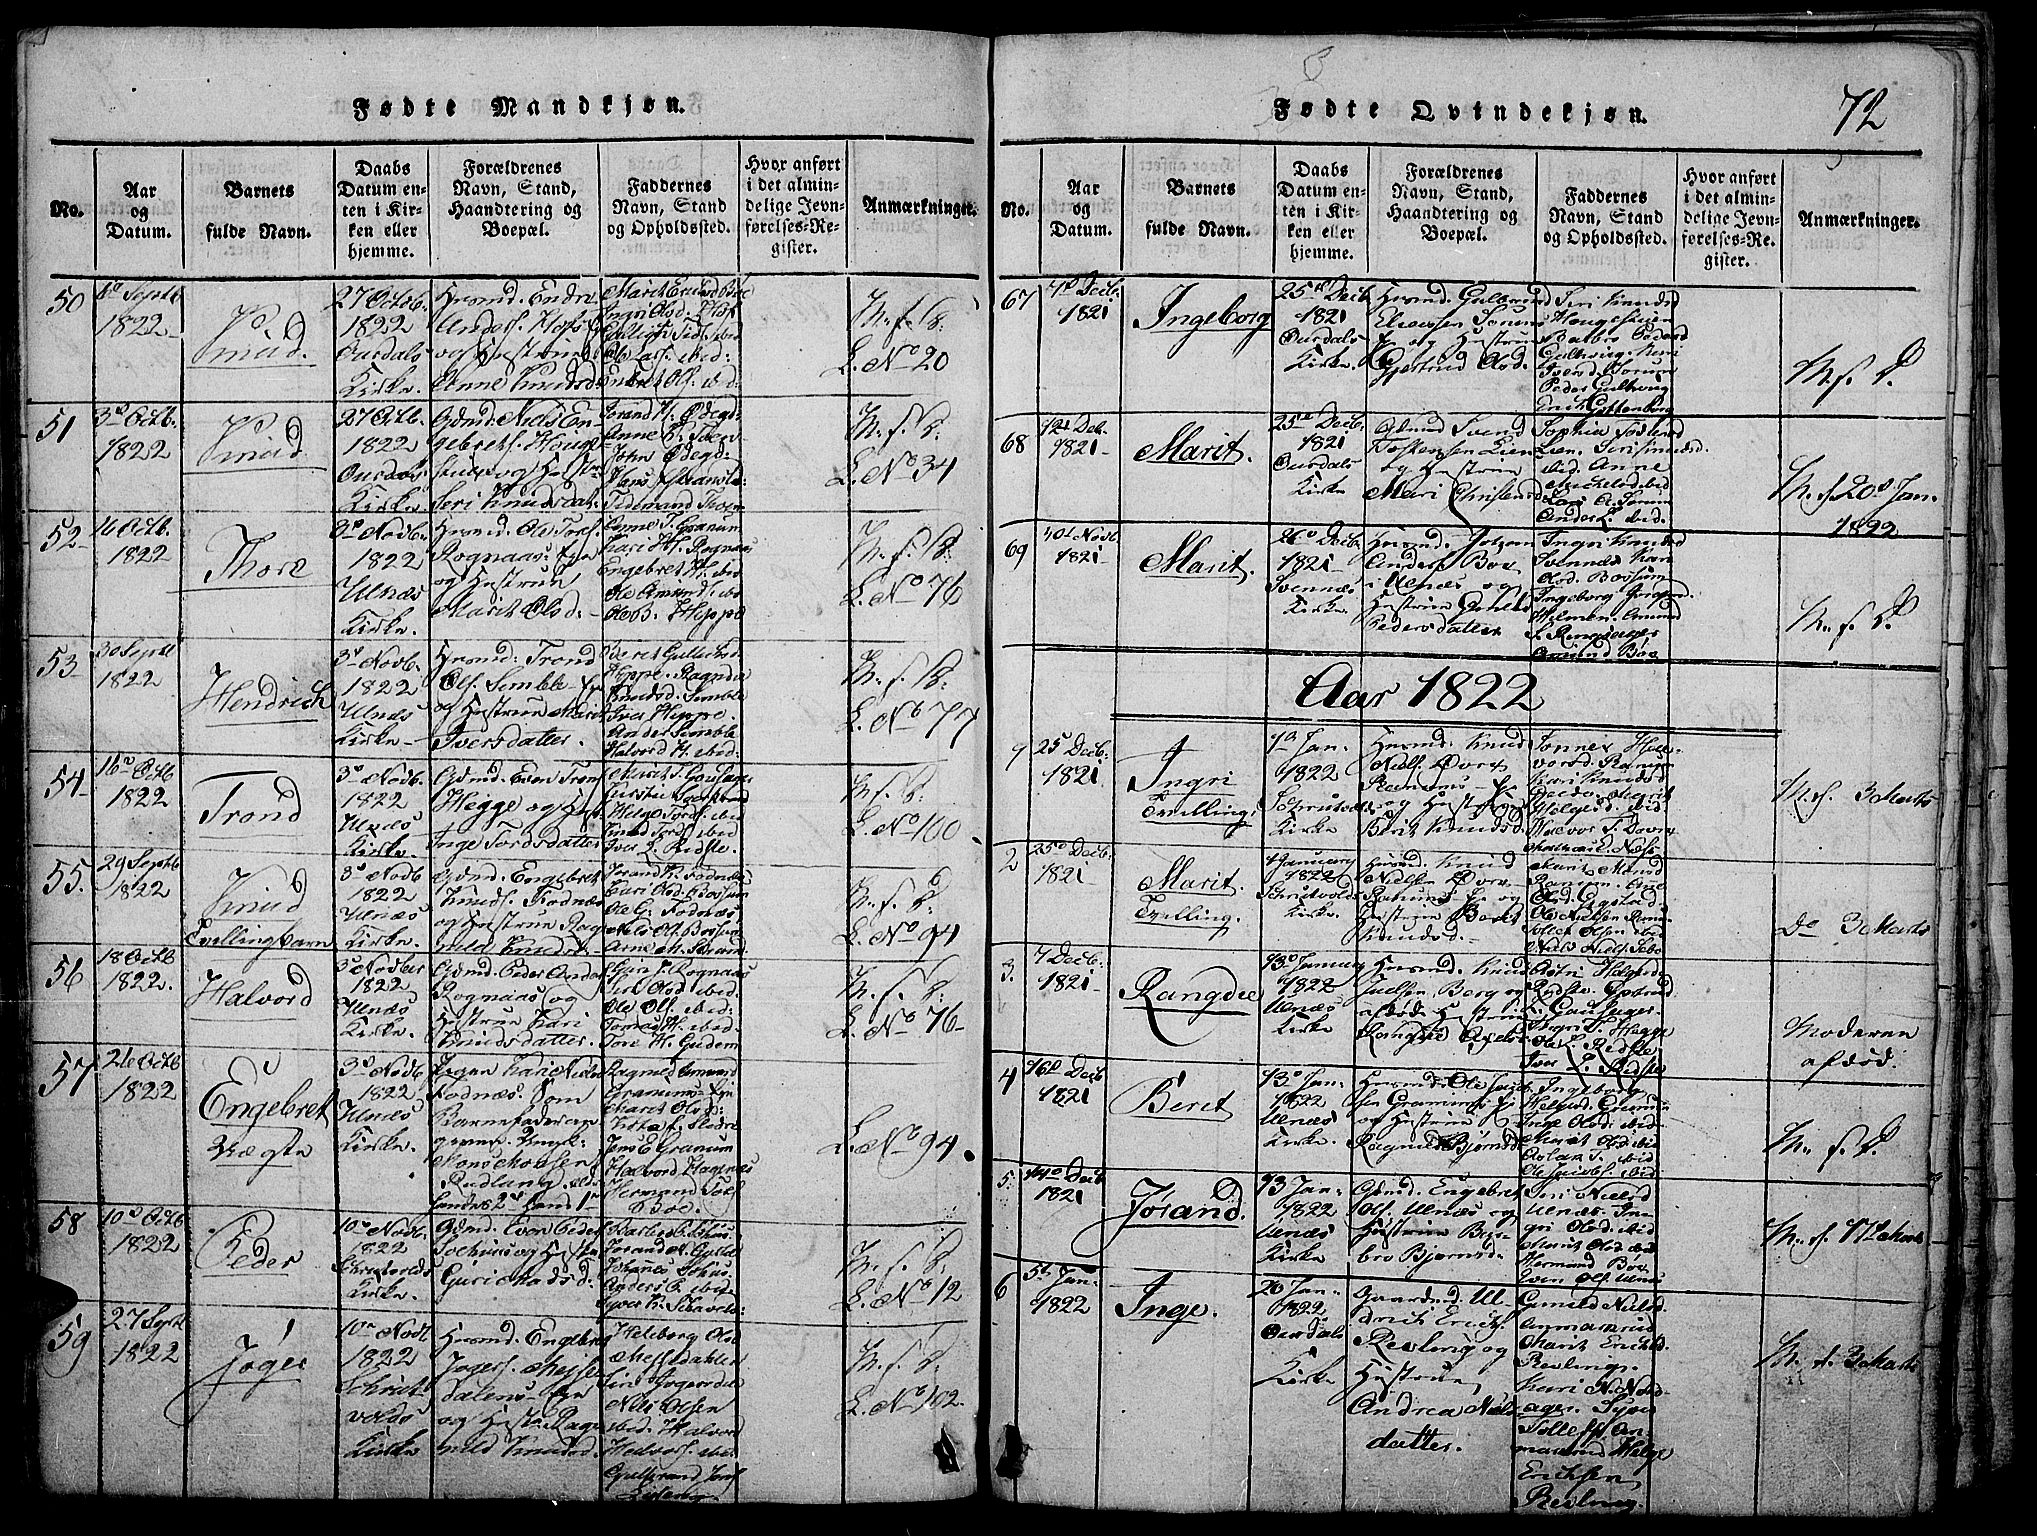 SAH, Nord-Aurdal prestekontor, Ministerialbok nr. 2, 1816-1828, s. 72